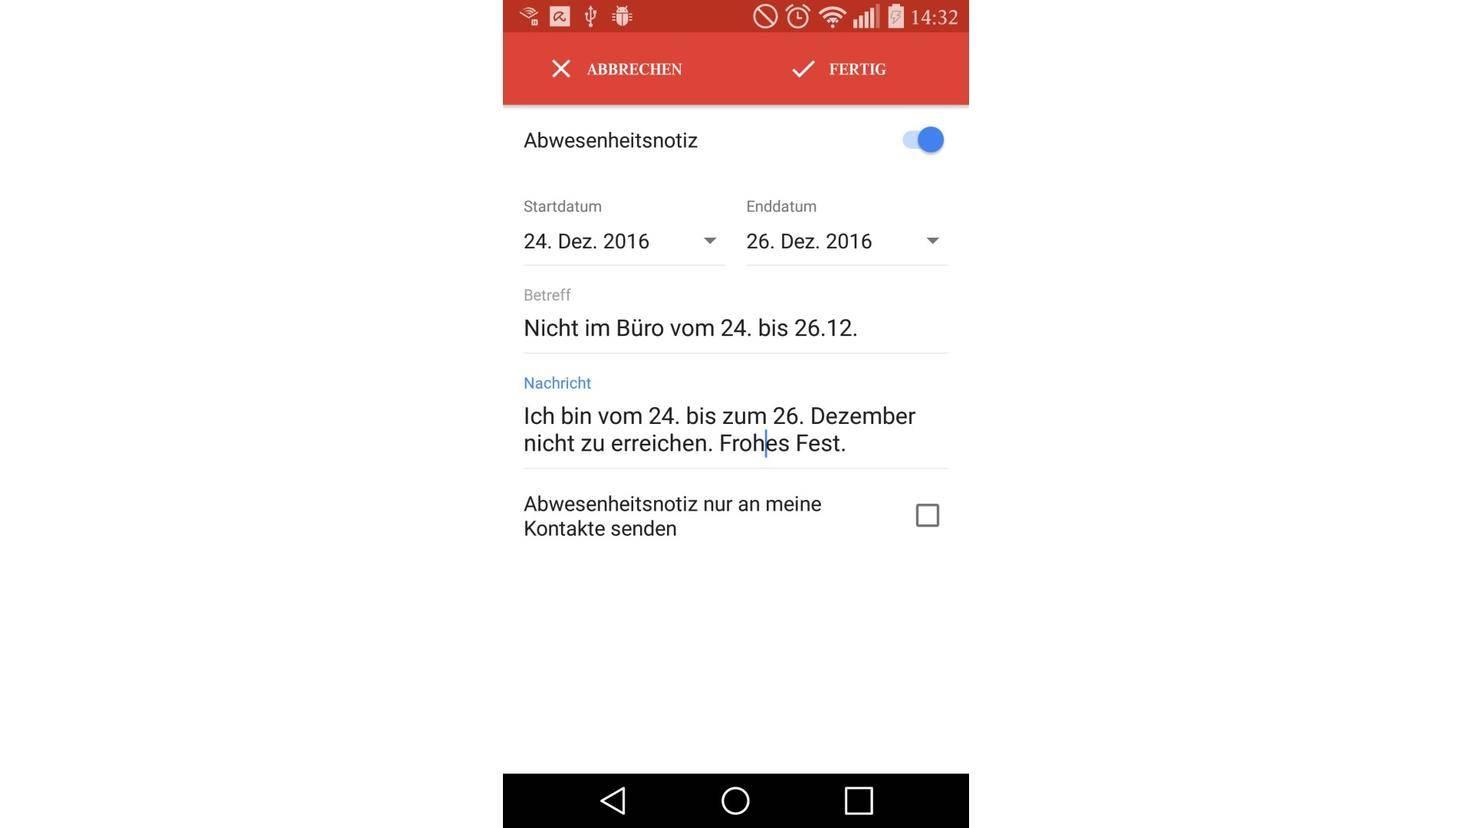 Google Mail Abwesenheitsnotiz